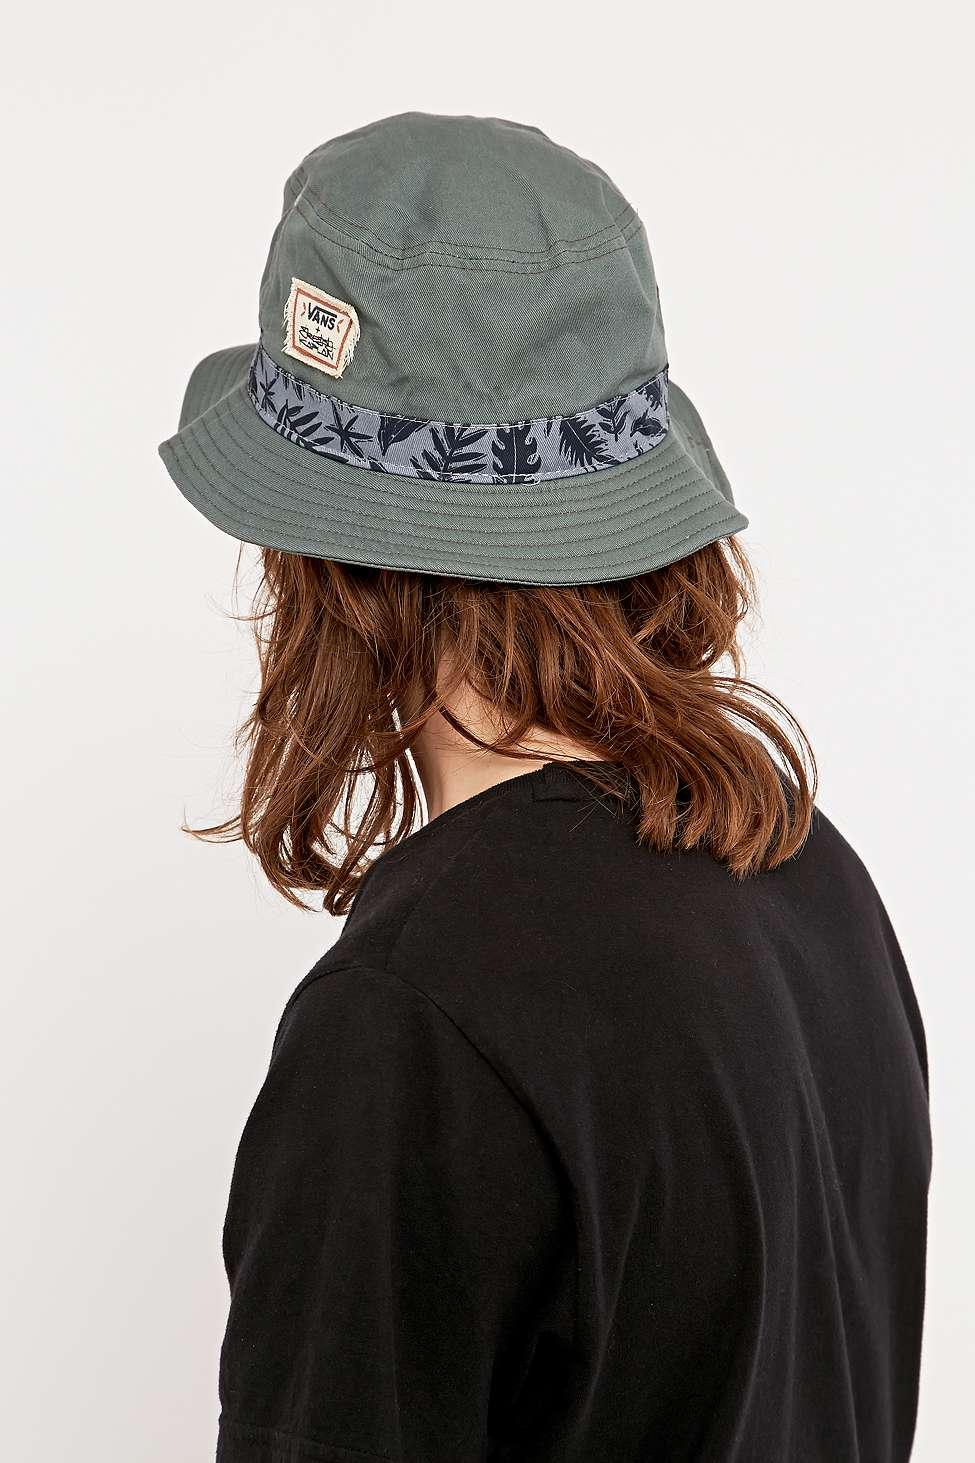 Vans Kaplan Bucket Hat In Moss in Green for Men - Lyst 41a473a6c42